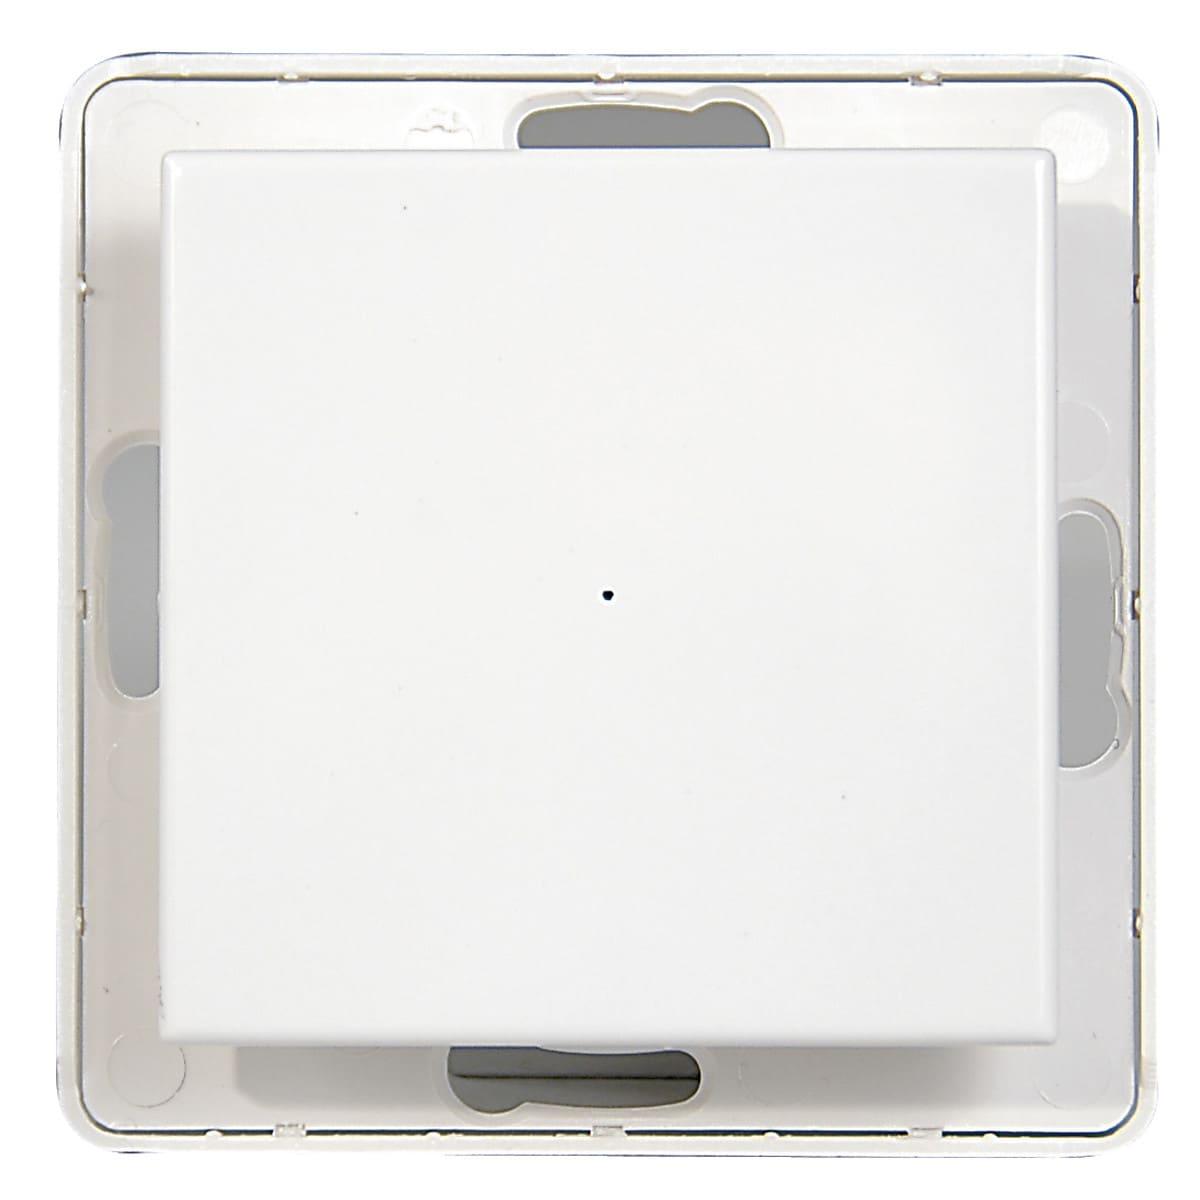 NEXA WTE-1/WTE-2 trådløs bryter